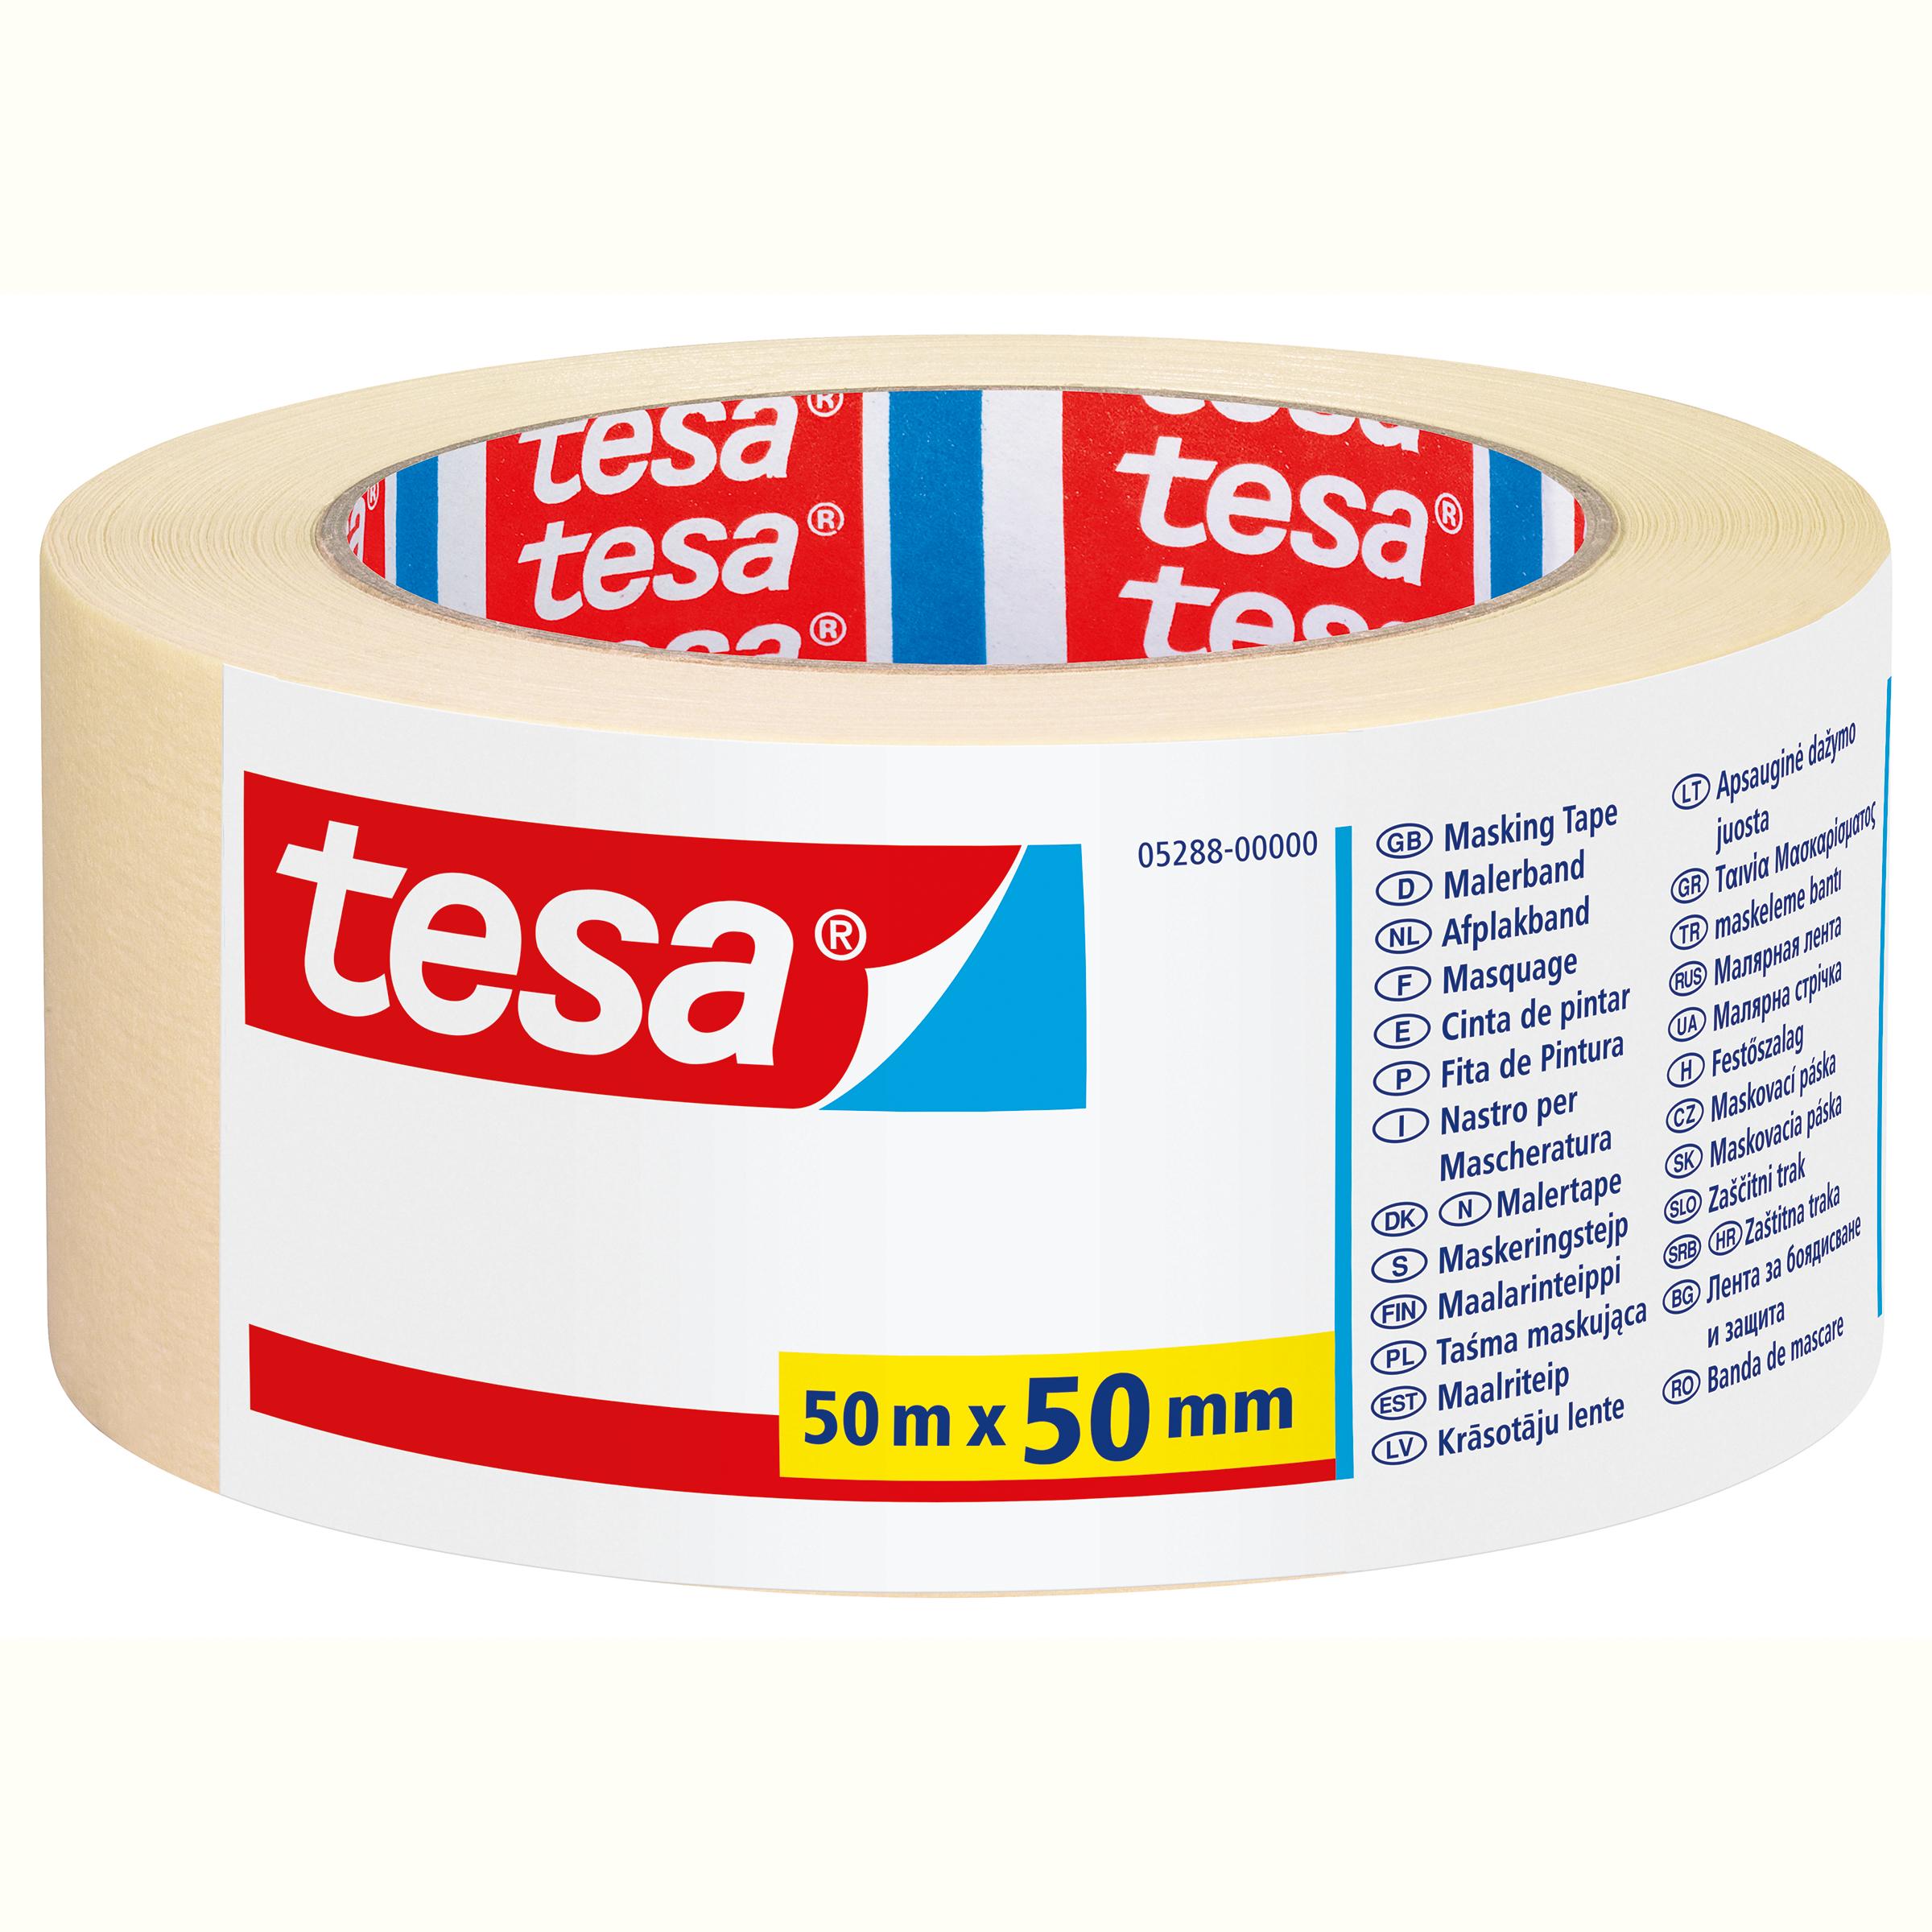 Tesa 05288 - Maler-Abdeckband - Papier - Beige - 4 Tag(e) - 50 m - 50 mm